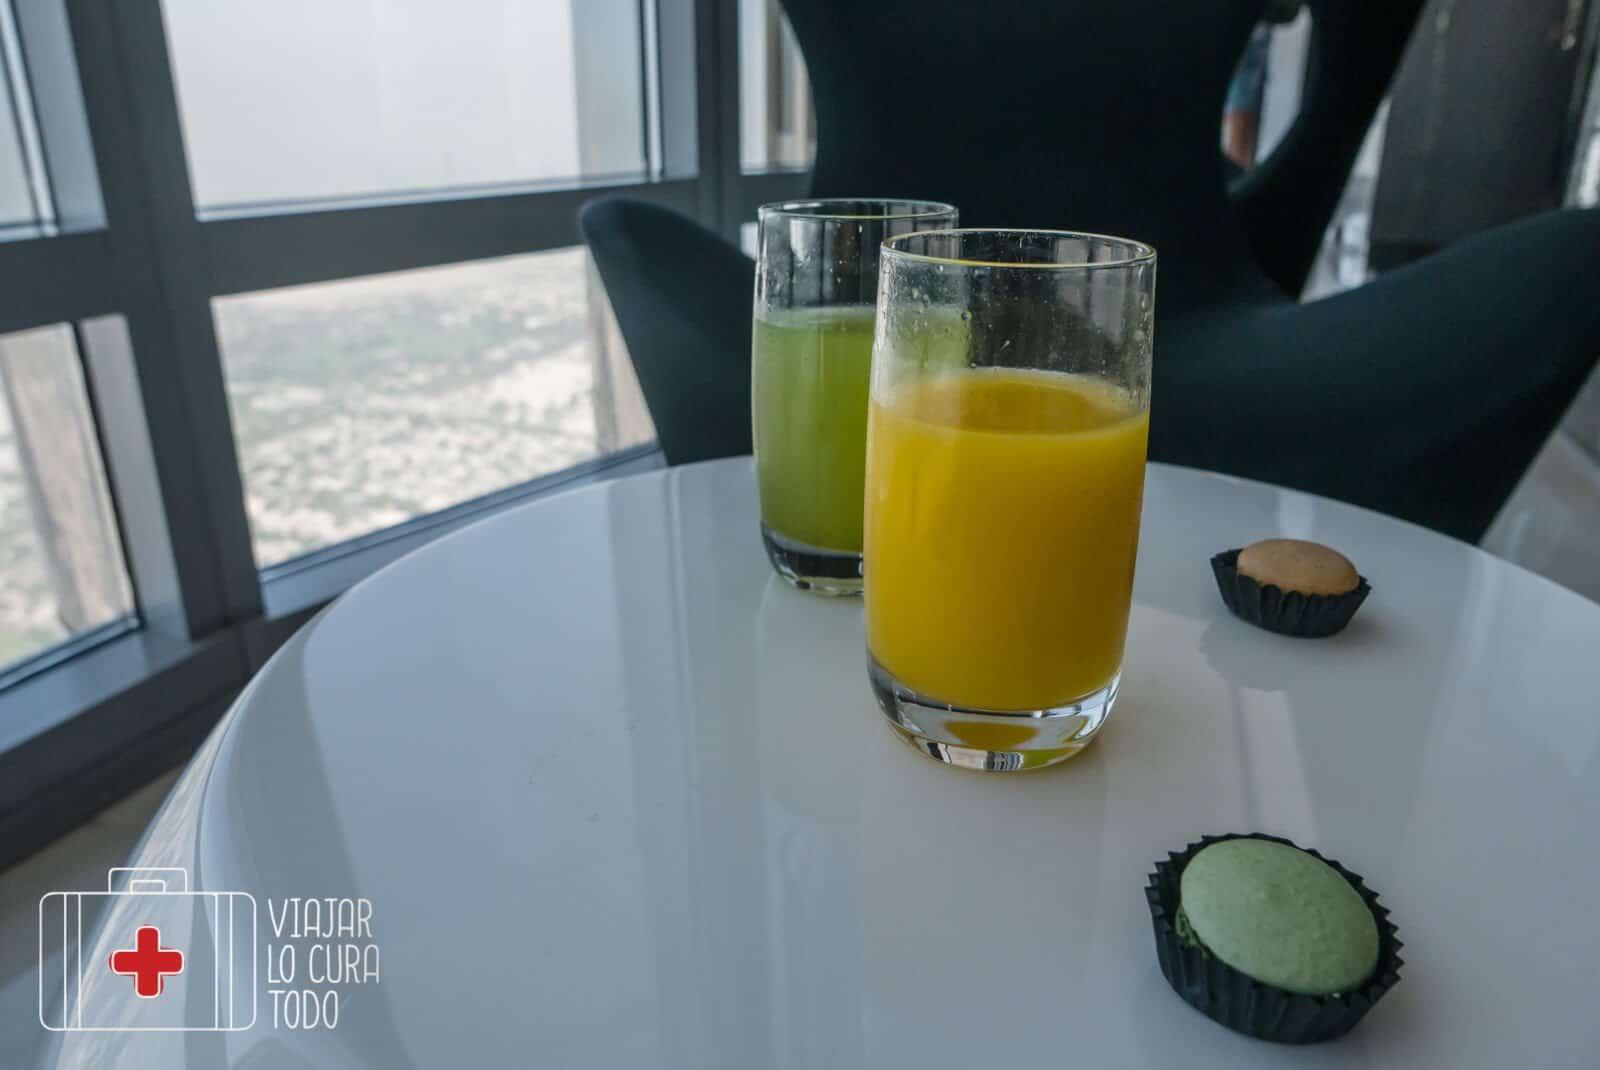 At the Top Sky Lounge Dubai